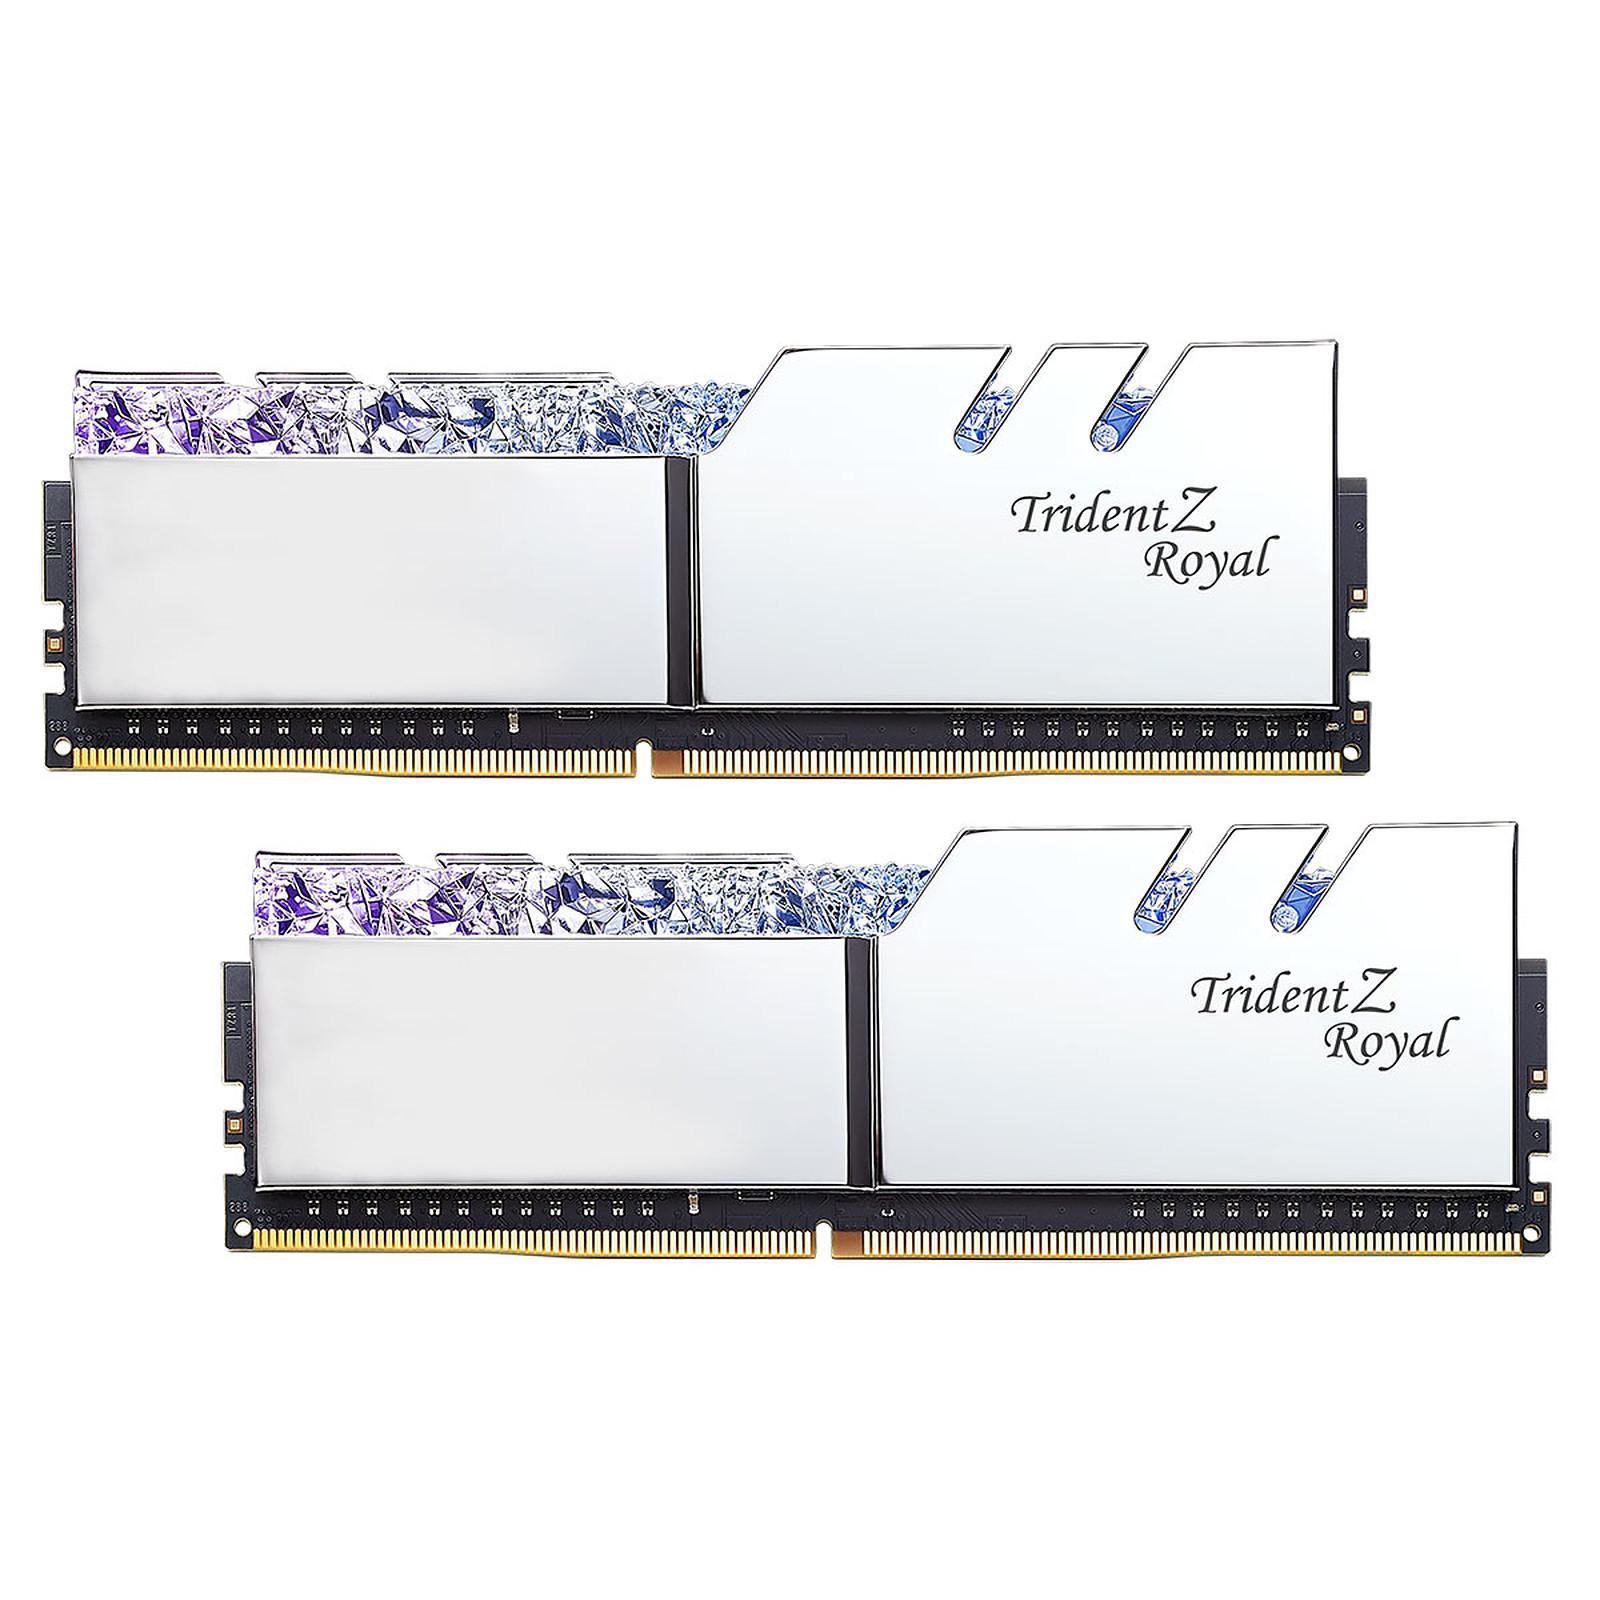 G.Skill Trident Z Royal 16GB (2 x 8GB) DDR4 4400 MHz CL18 - Plata